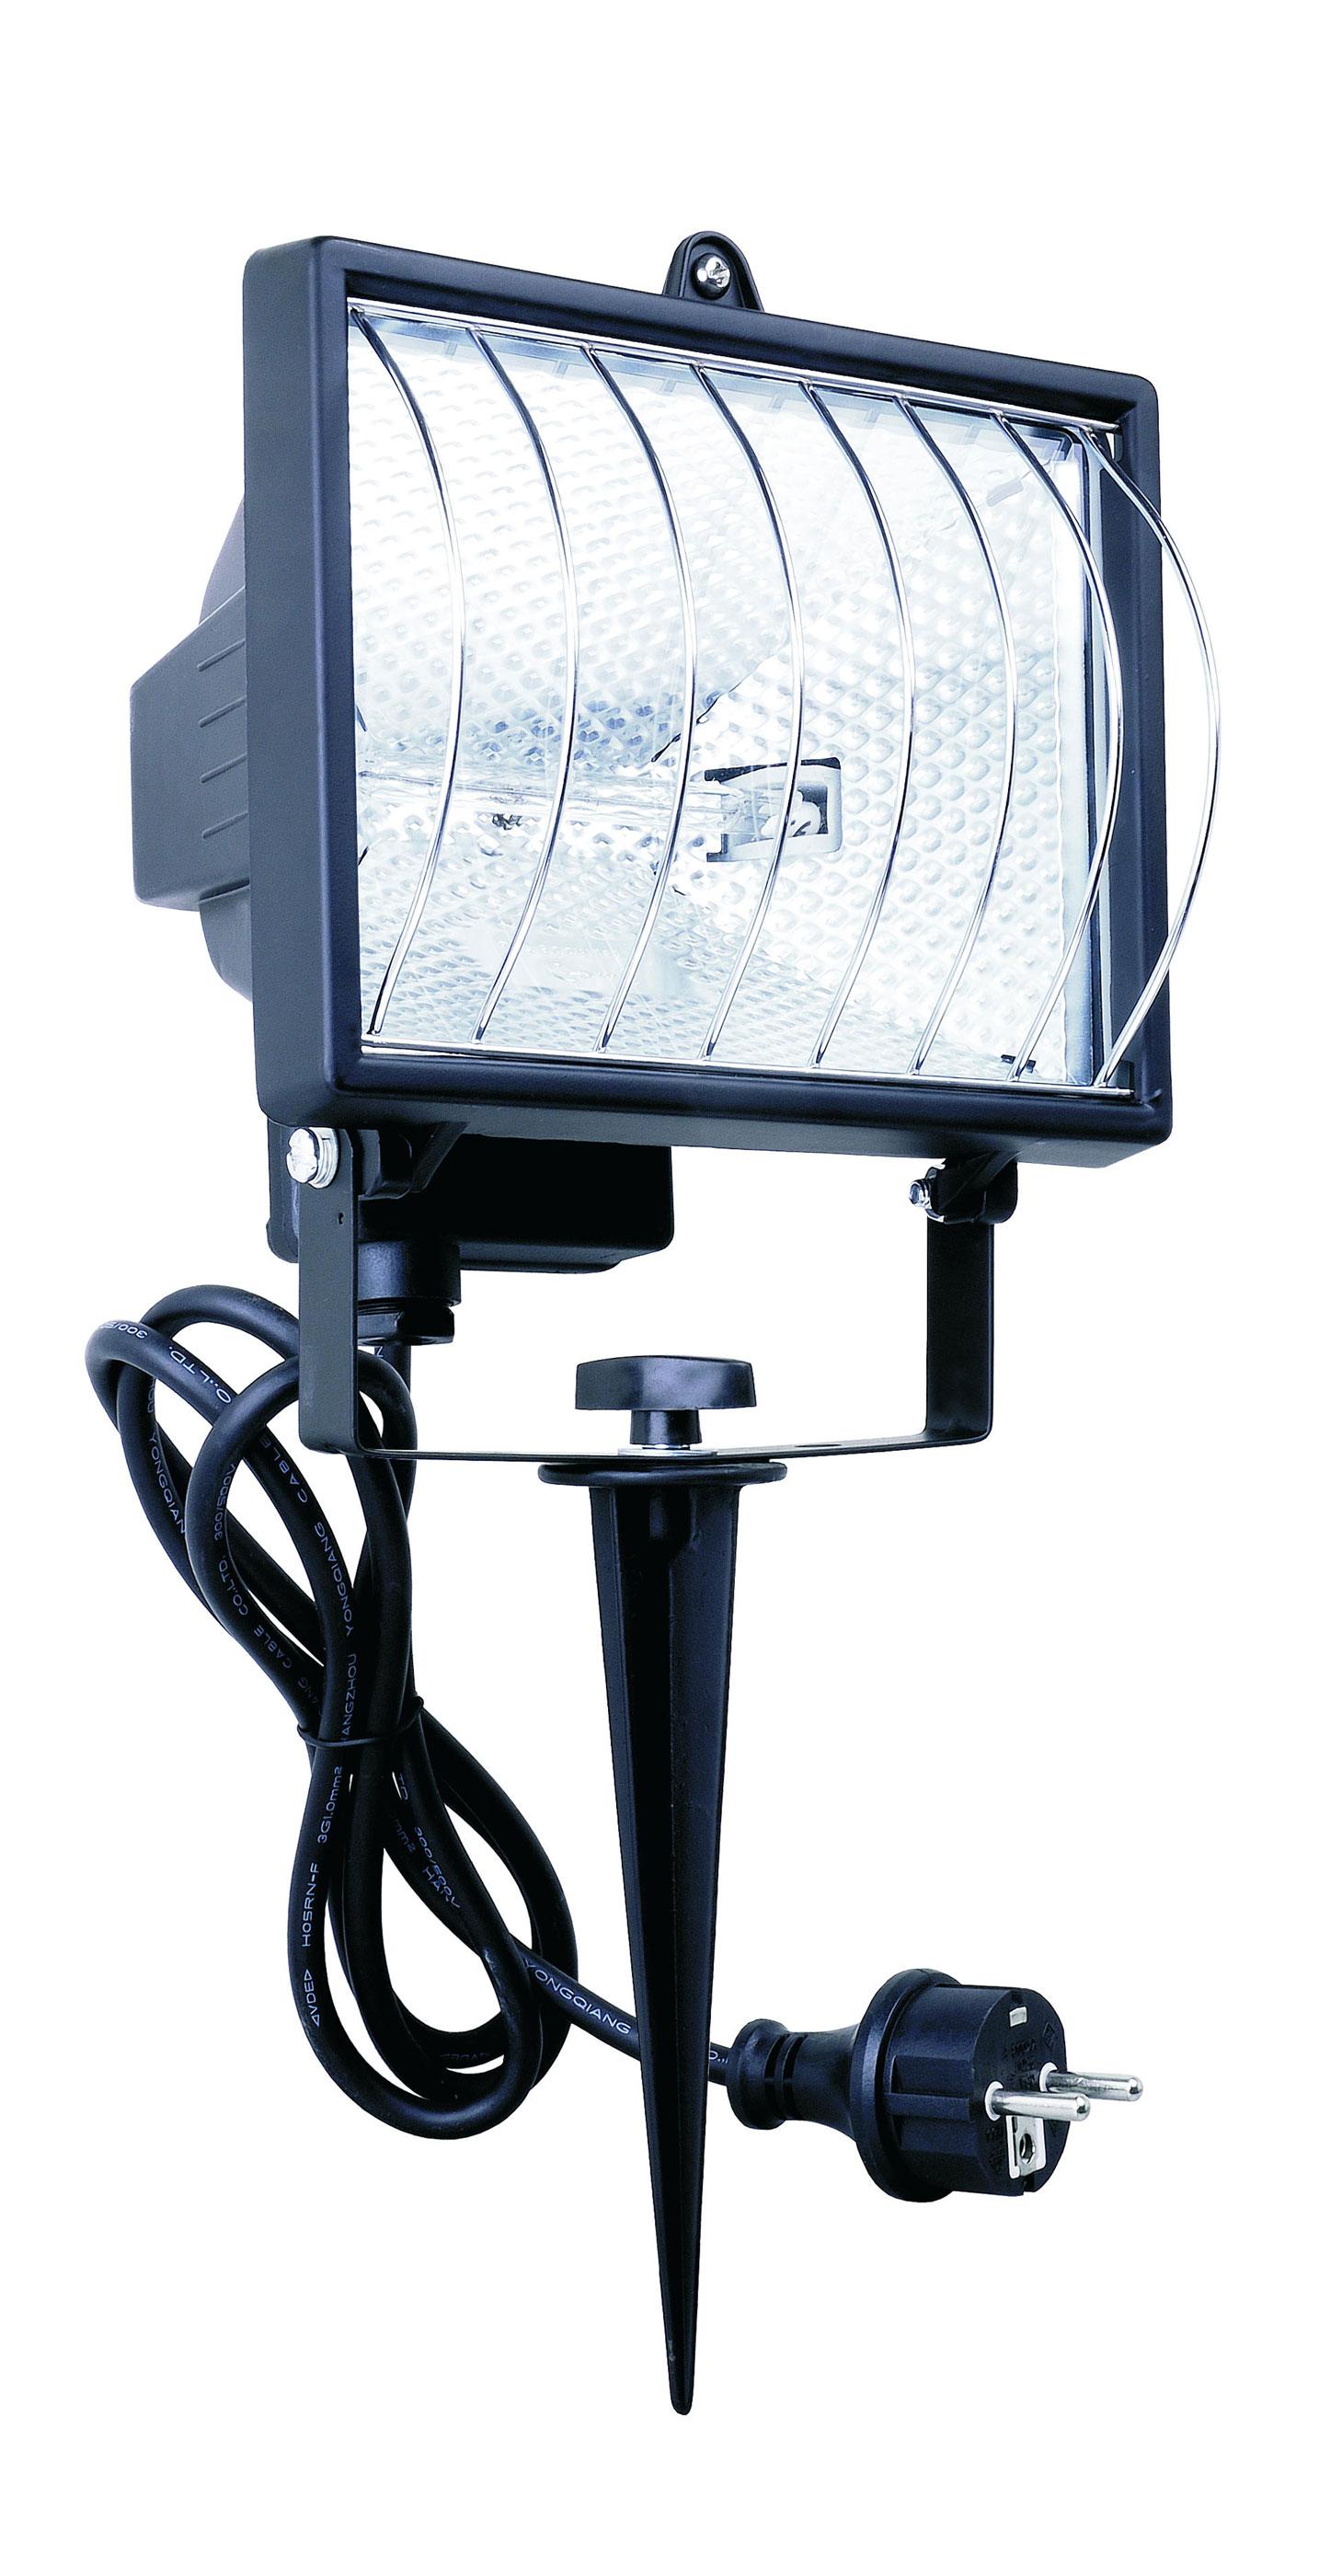 halogenstrahler mit spie baustrahler ip54 400 watt bei. Black Bedroom Furniture Sets. Home Design Ideas